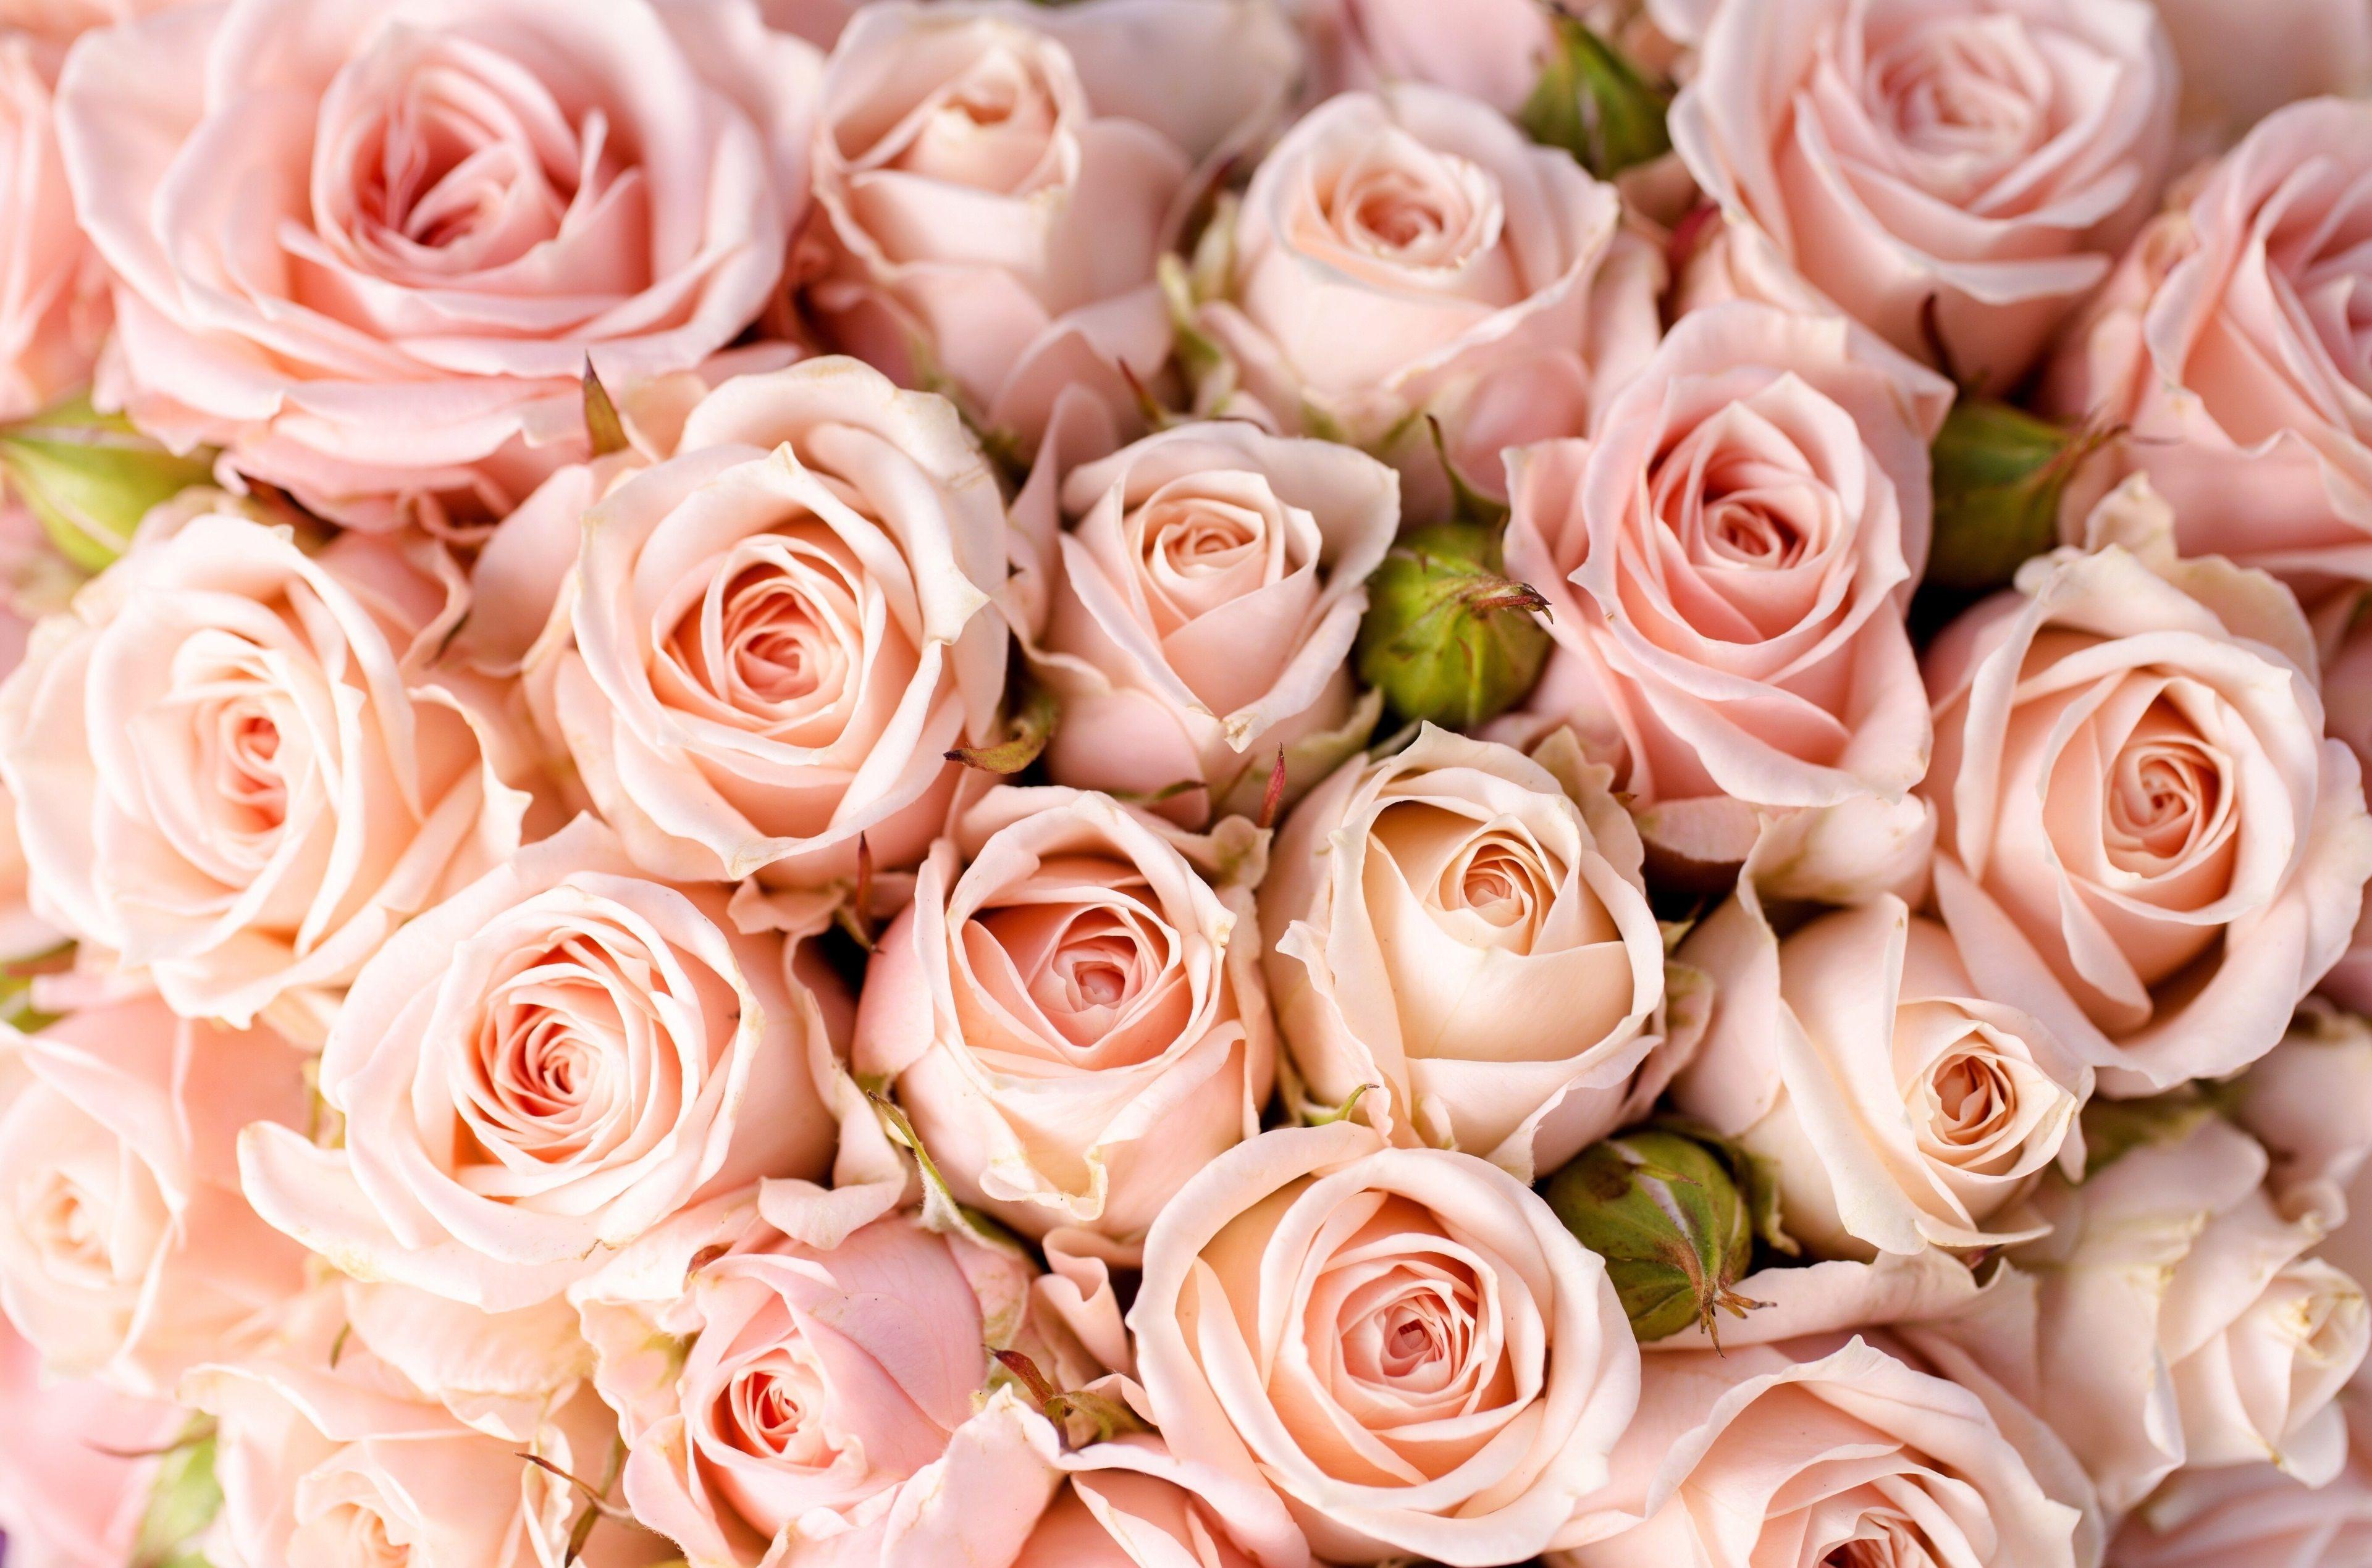 3840x2539 Roses 4k Hd High Resolution Wallpaper Rose Flower Wallpaper Pink Roses Background Pink Rose Flower